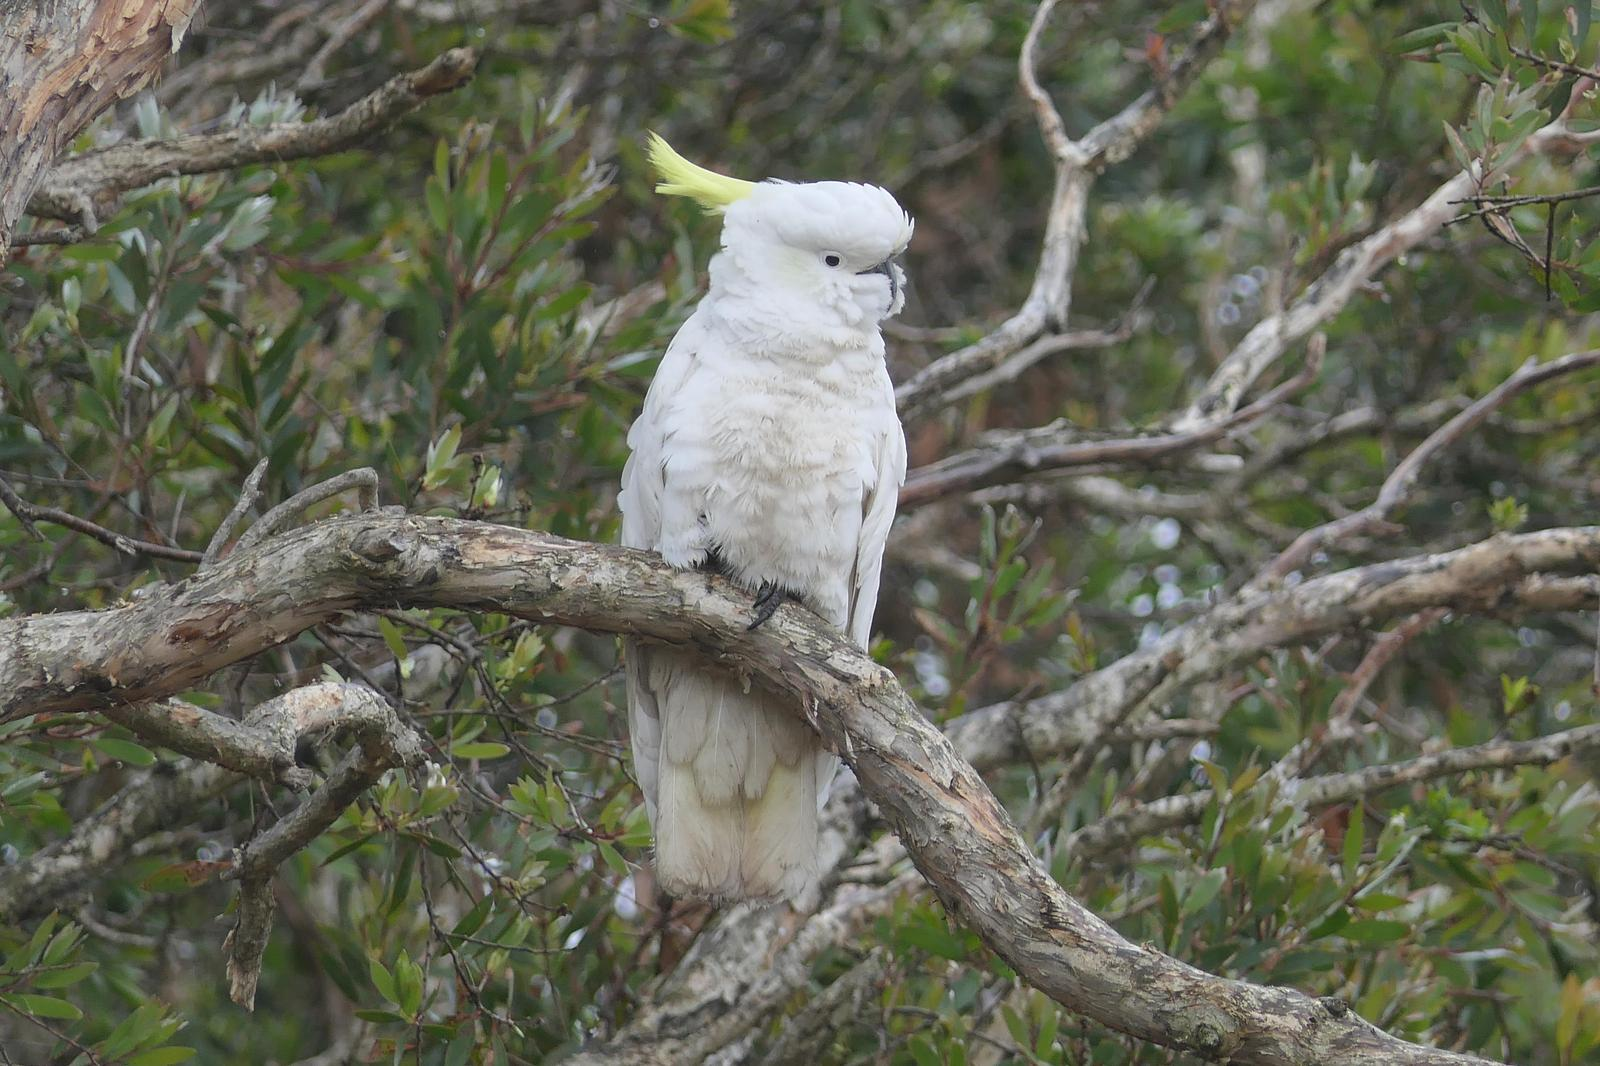 Sulphur-crested Cockatoo Photo by Randy Siebert